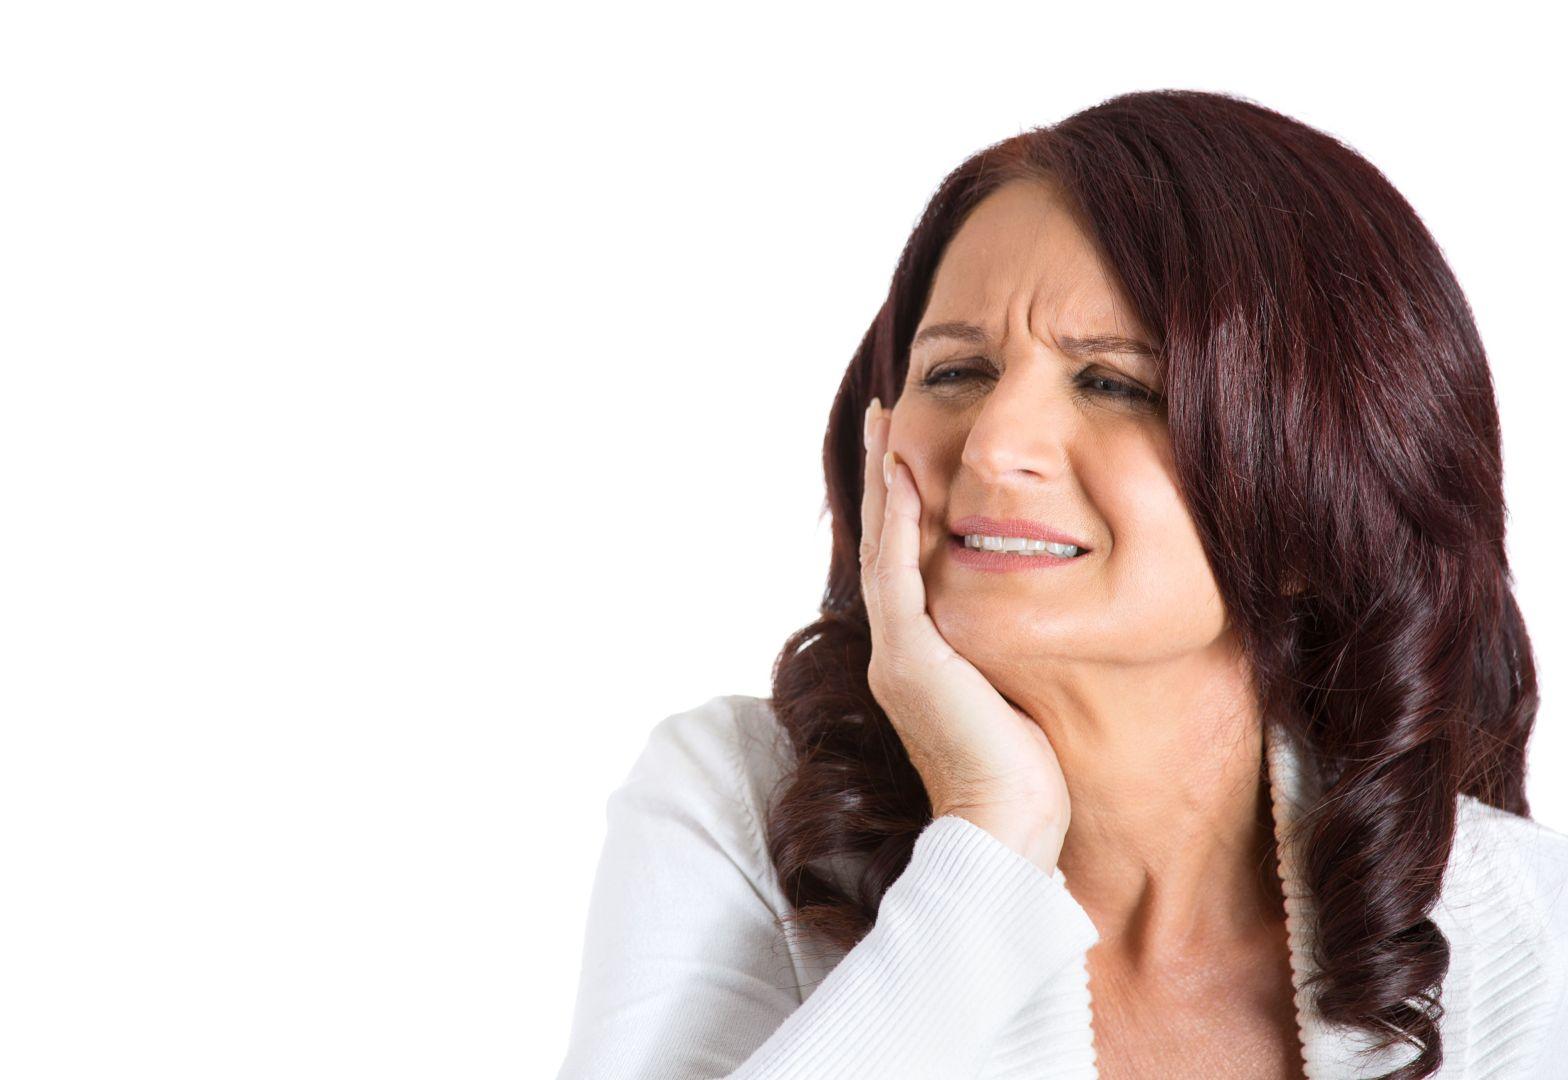 Treatment of trigeminal neuralgia in Gurgaon